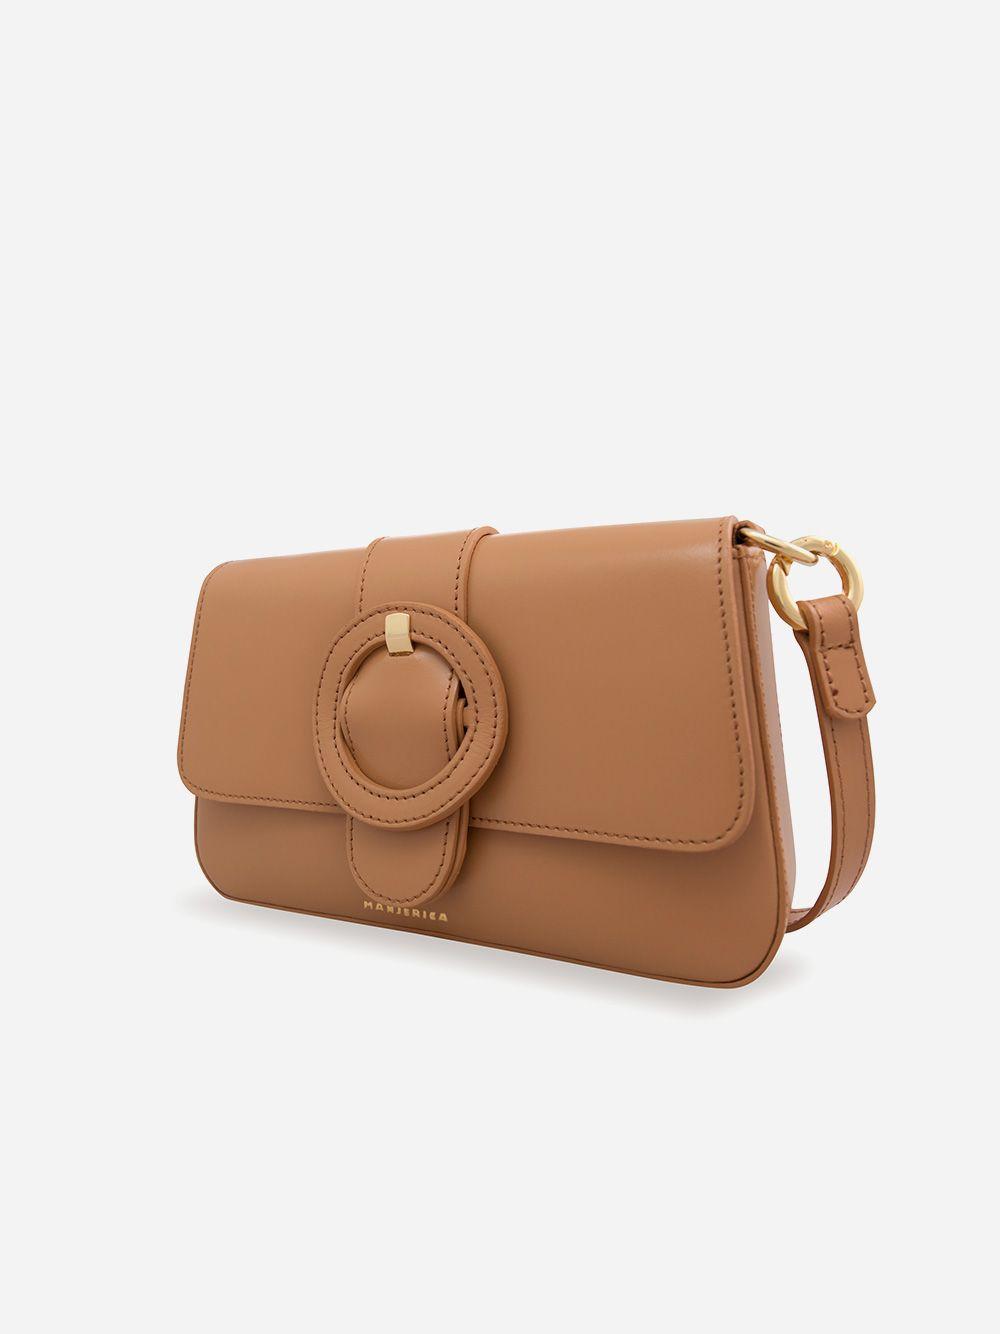 Caramel Mini Amália Bag | Manjerica